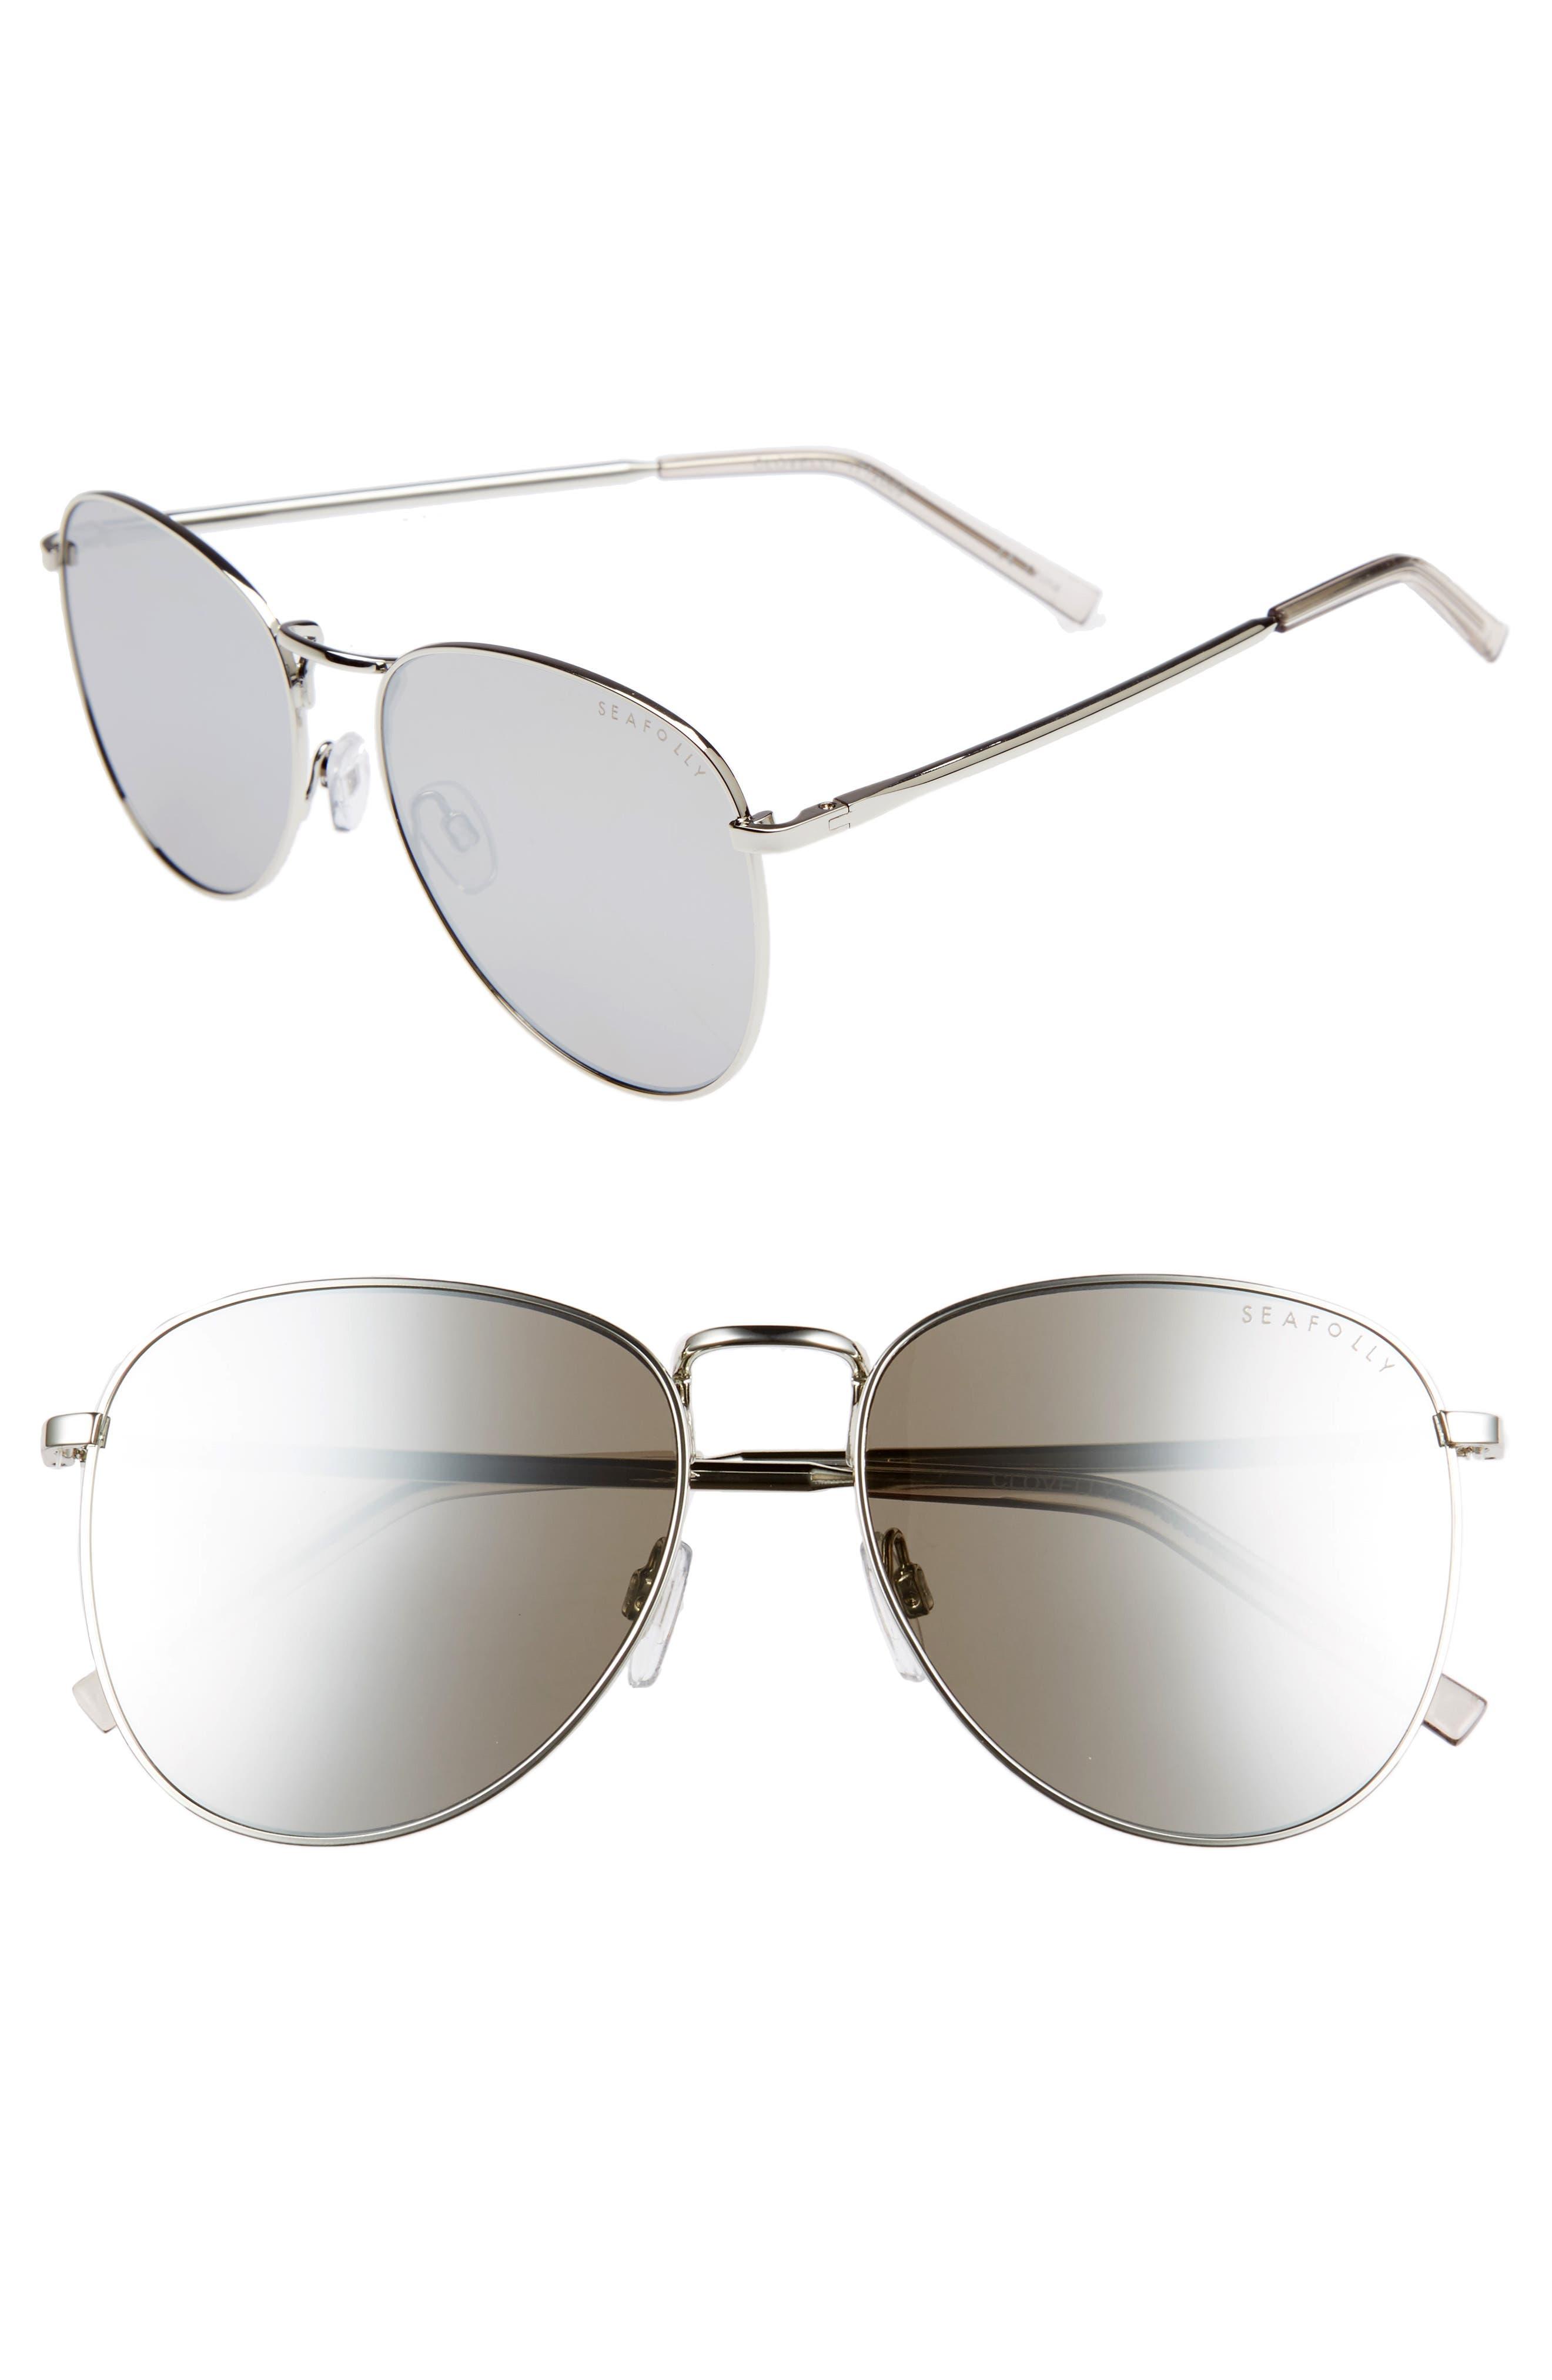 Clovelly 56mm Metal Sunglasses,                             Main thumbnail 1, color,                             Sand